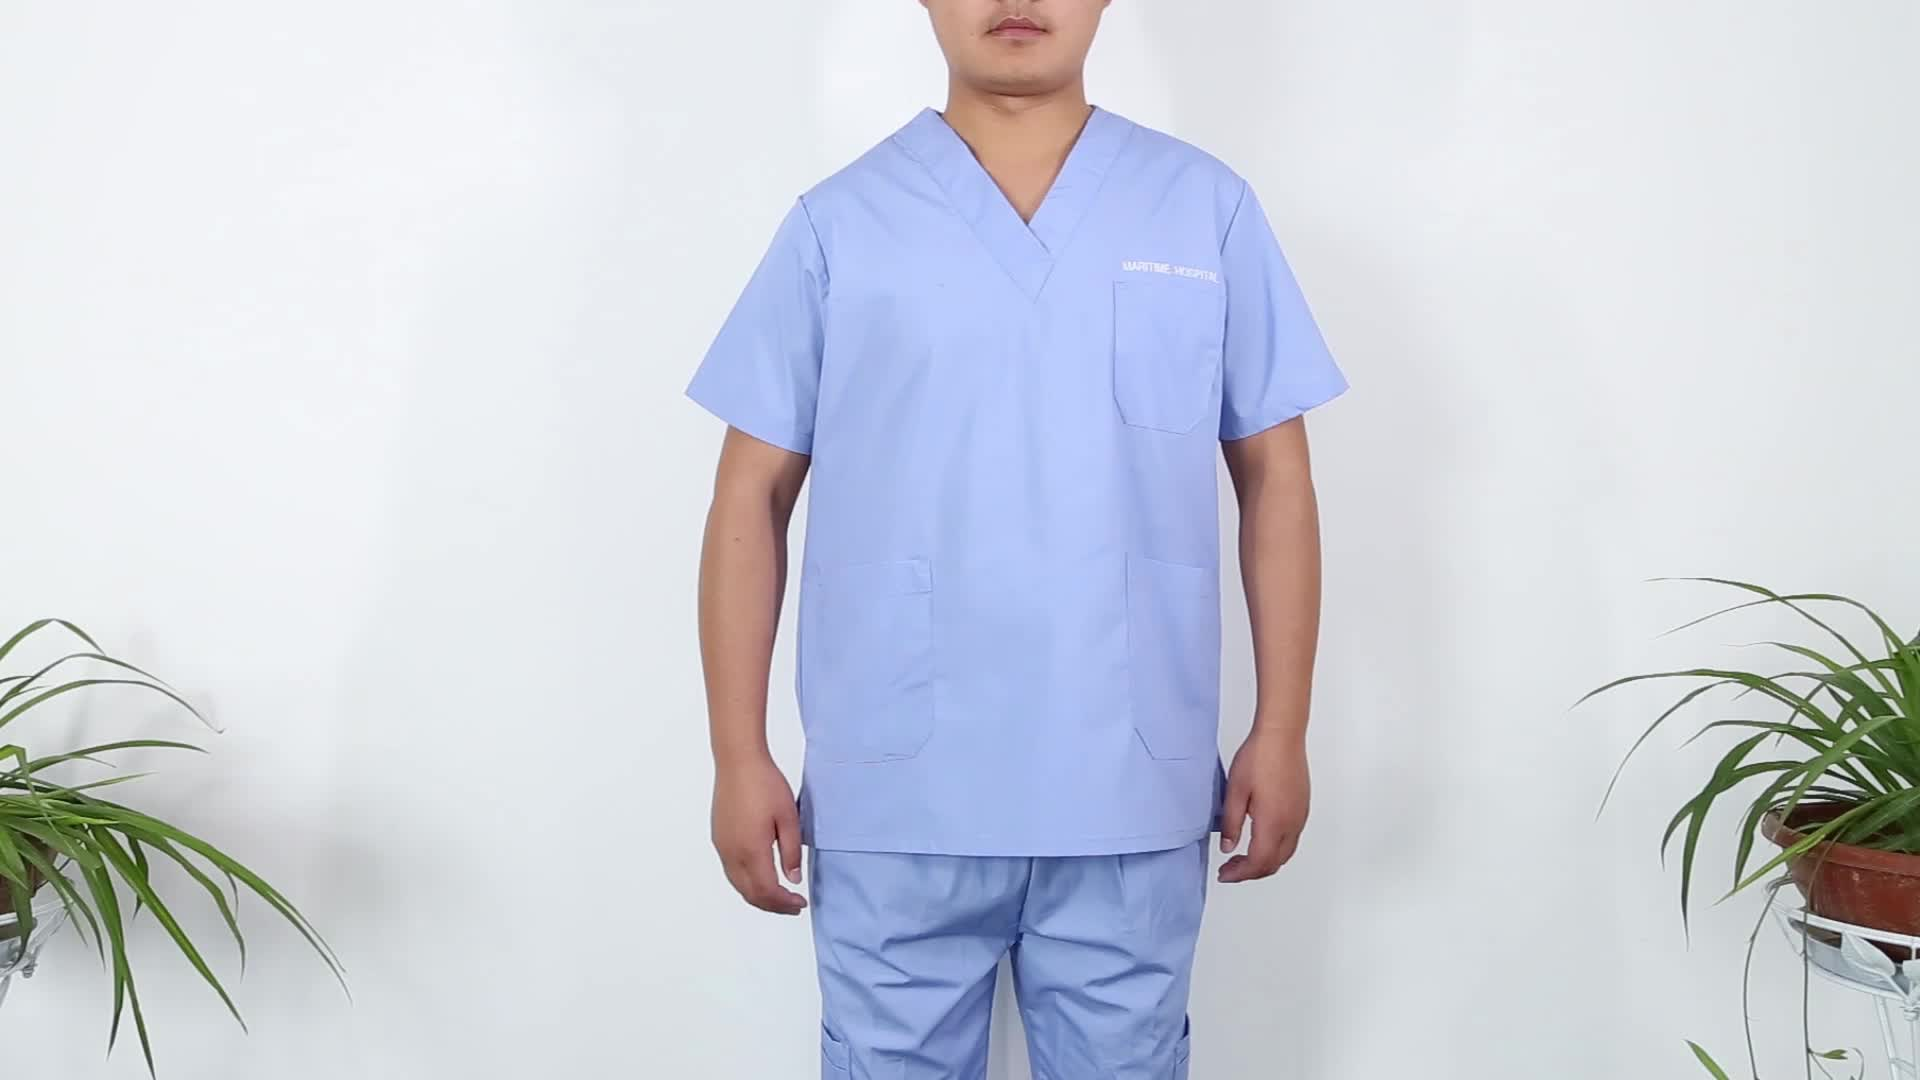 Unisex Medical Nursing Uniform Scrubs